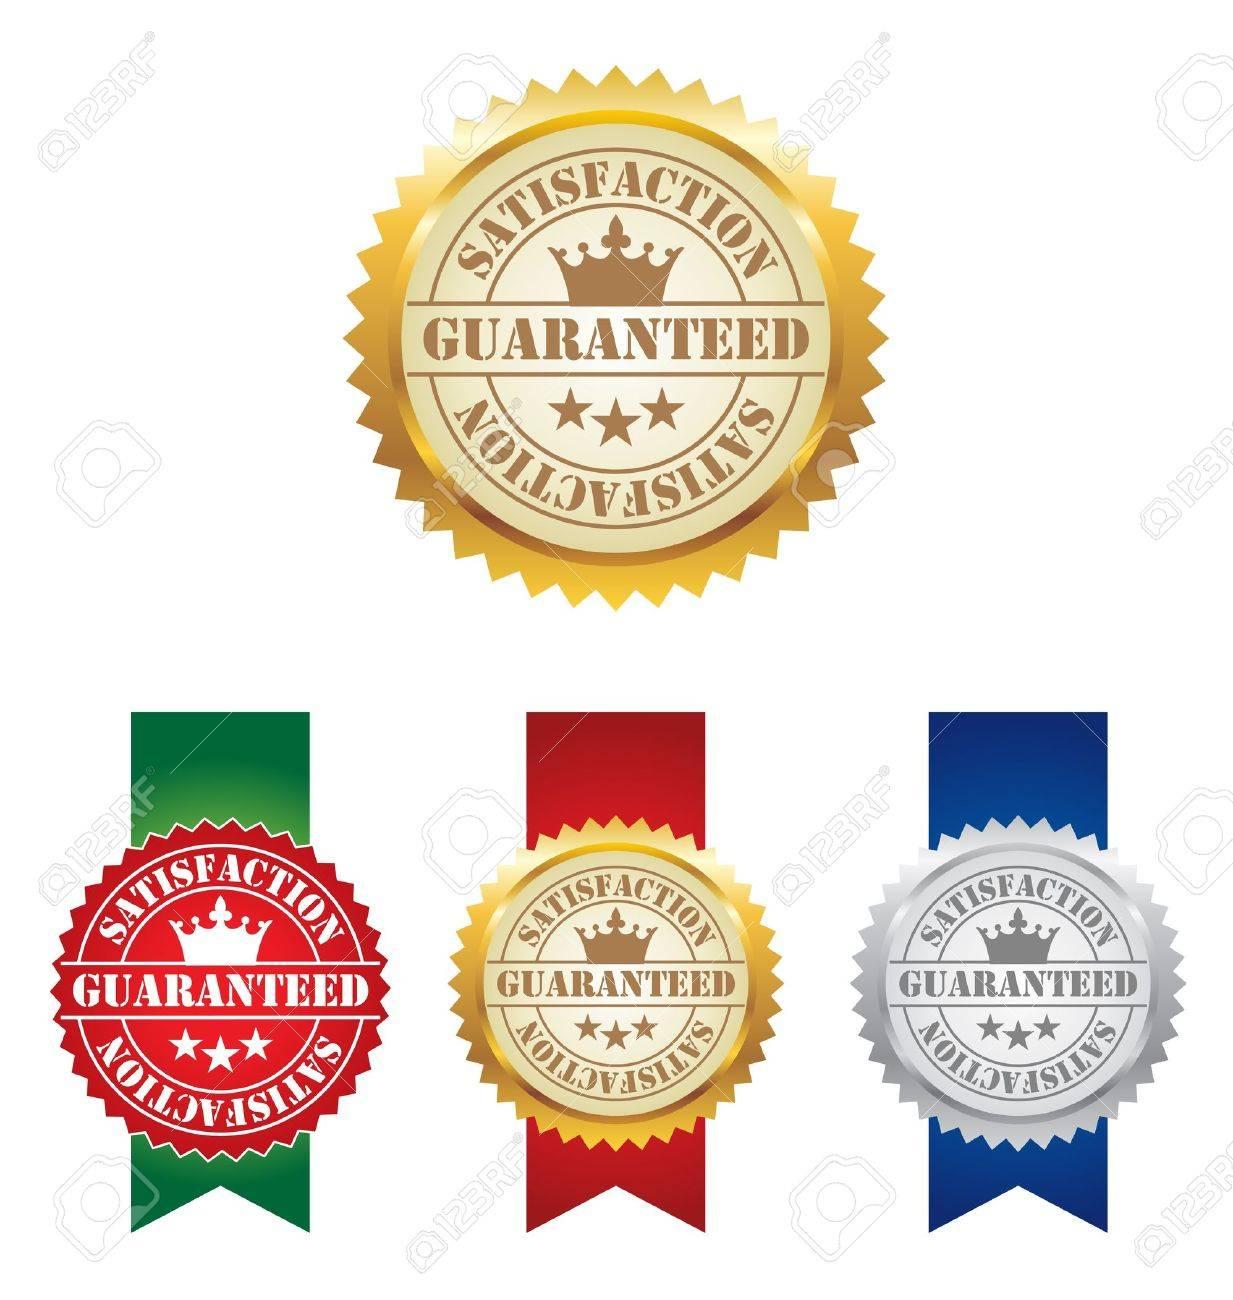 Vector Seal of Satisfaction Guaranteed Labels Stock Vector - 17084335